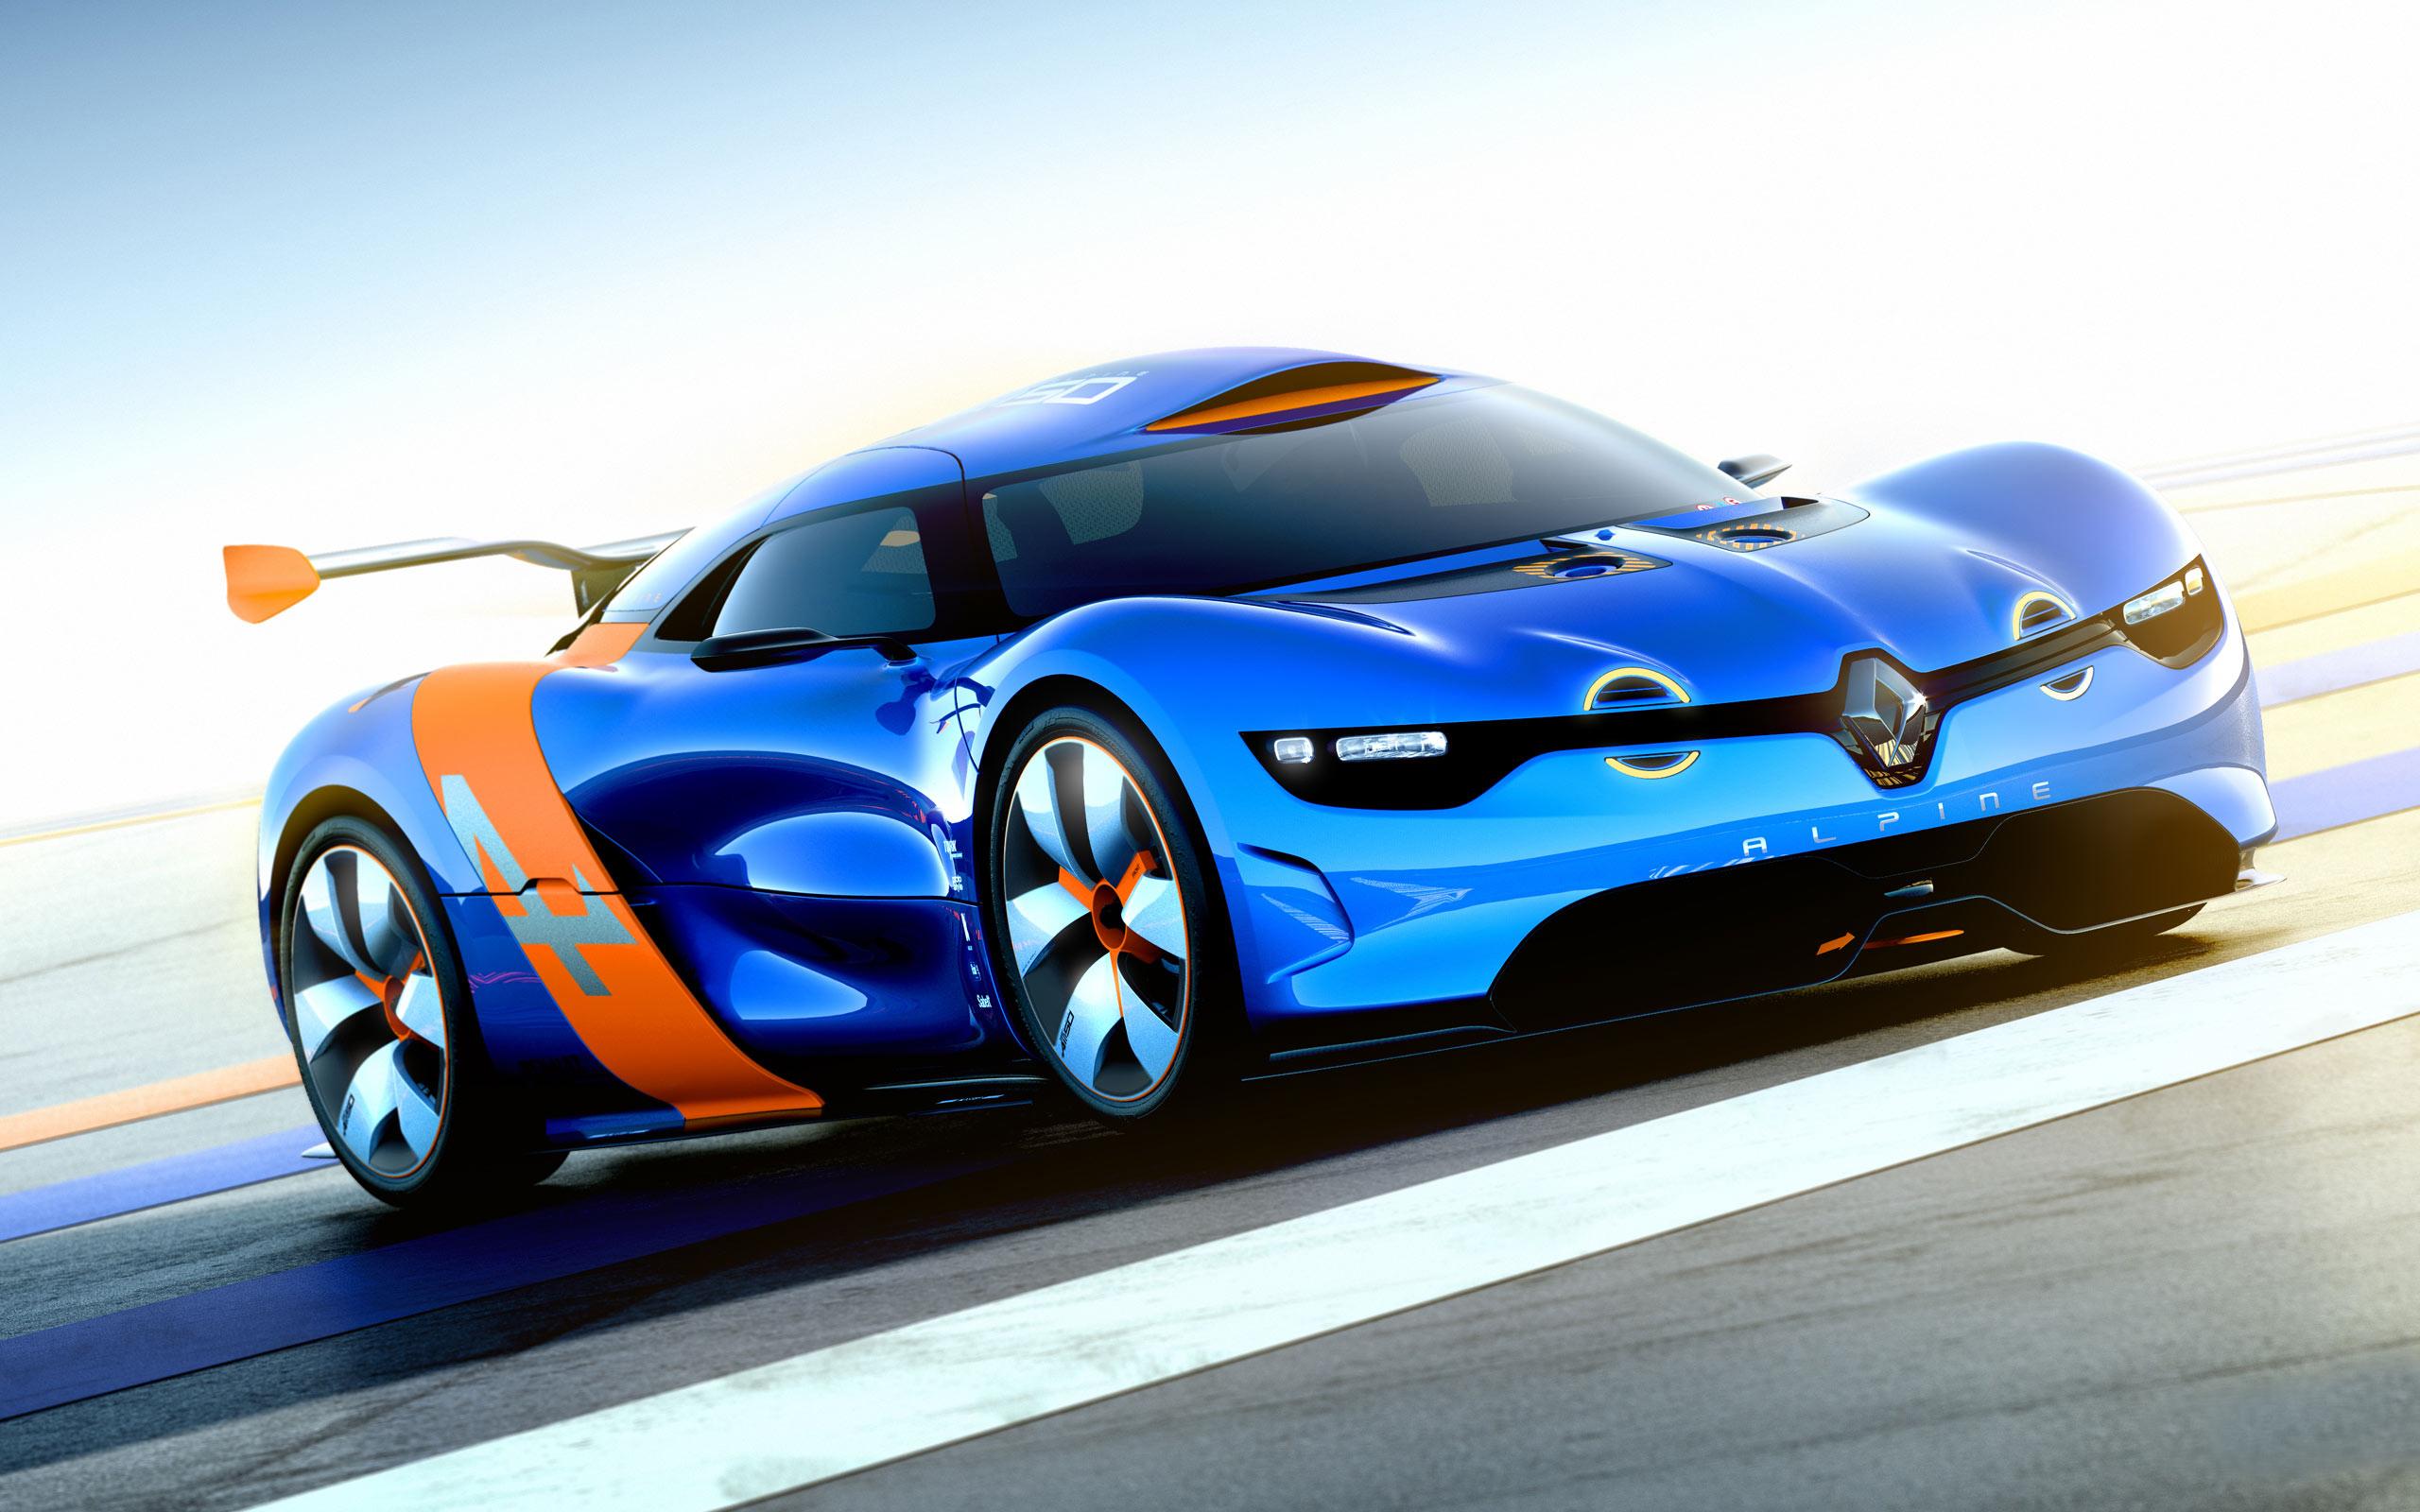 50s Car Wallpapers Iphone Renault Alpine A110 50 Concept Wallpaper Hd Car